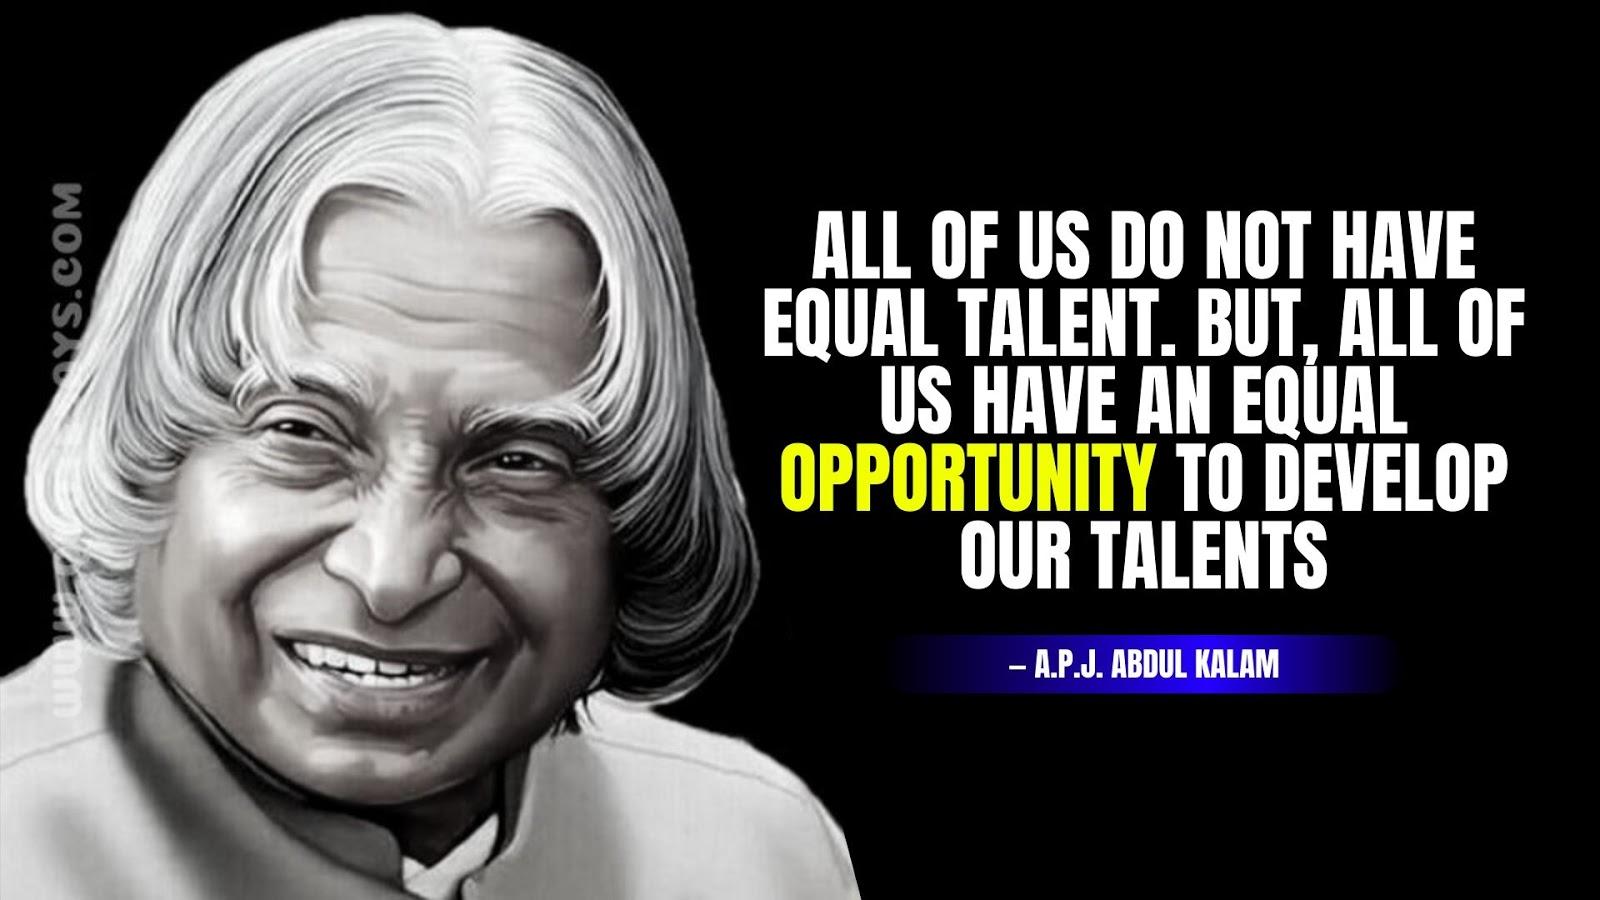 Apj Abdul Kalam Quotes About Education